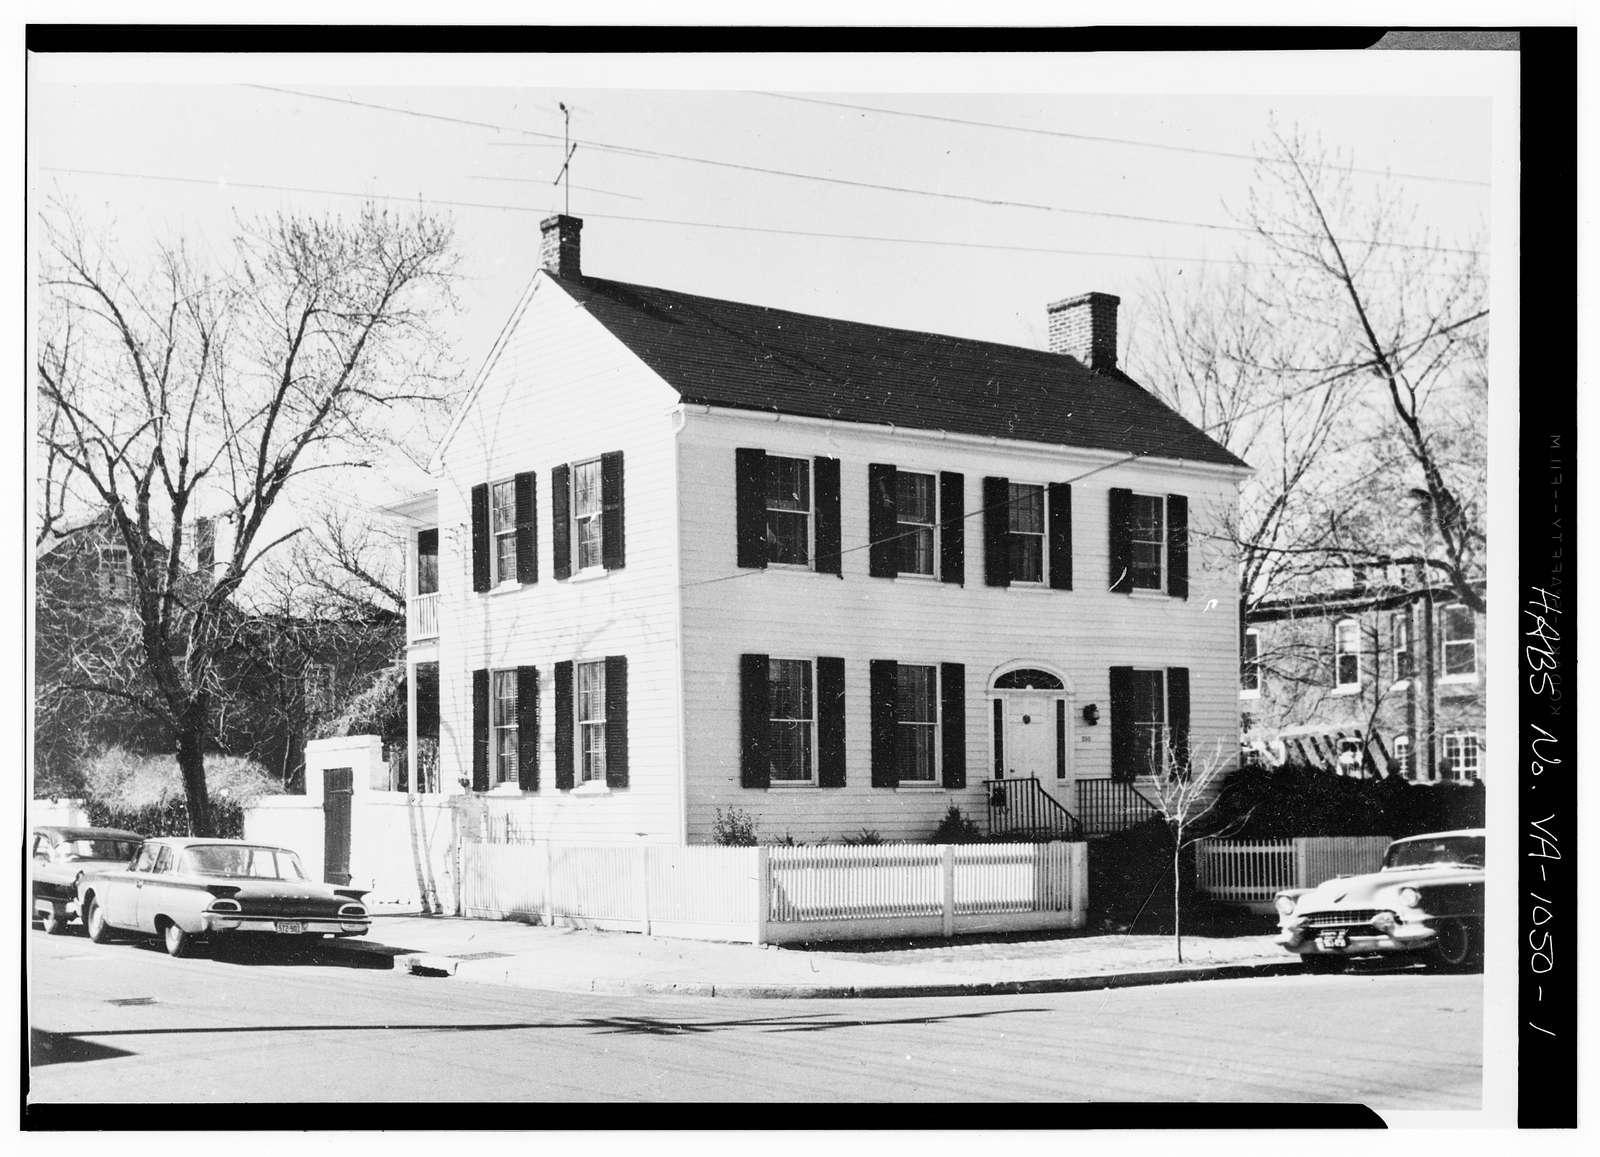 Duke Street Area Survey, 200 Duke Street (House), Alexandria, Independent City, VA